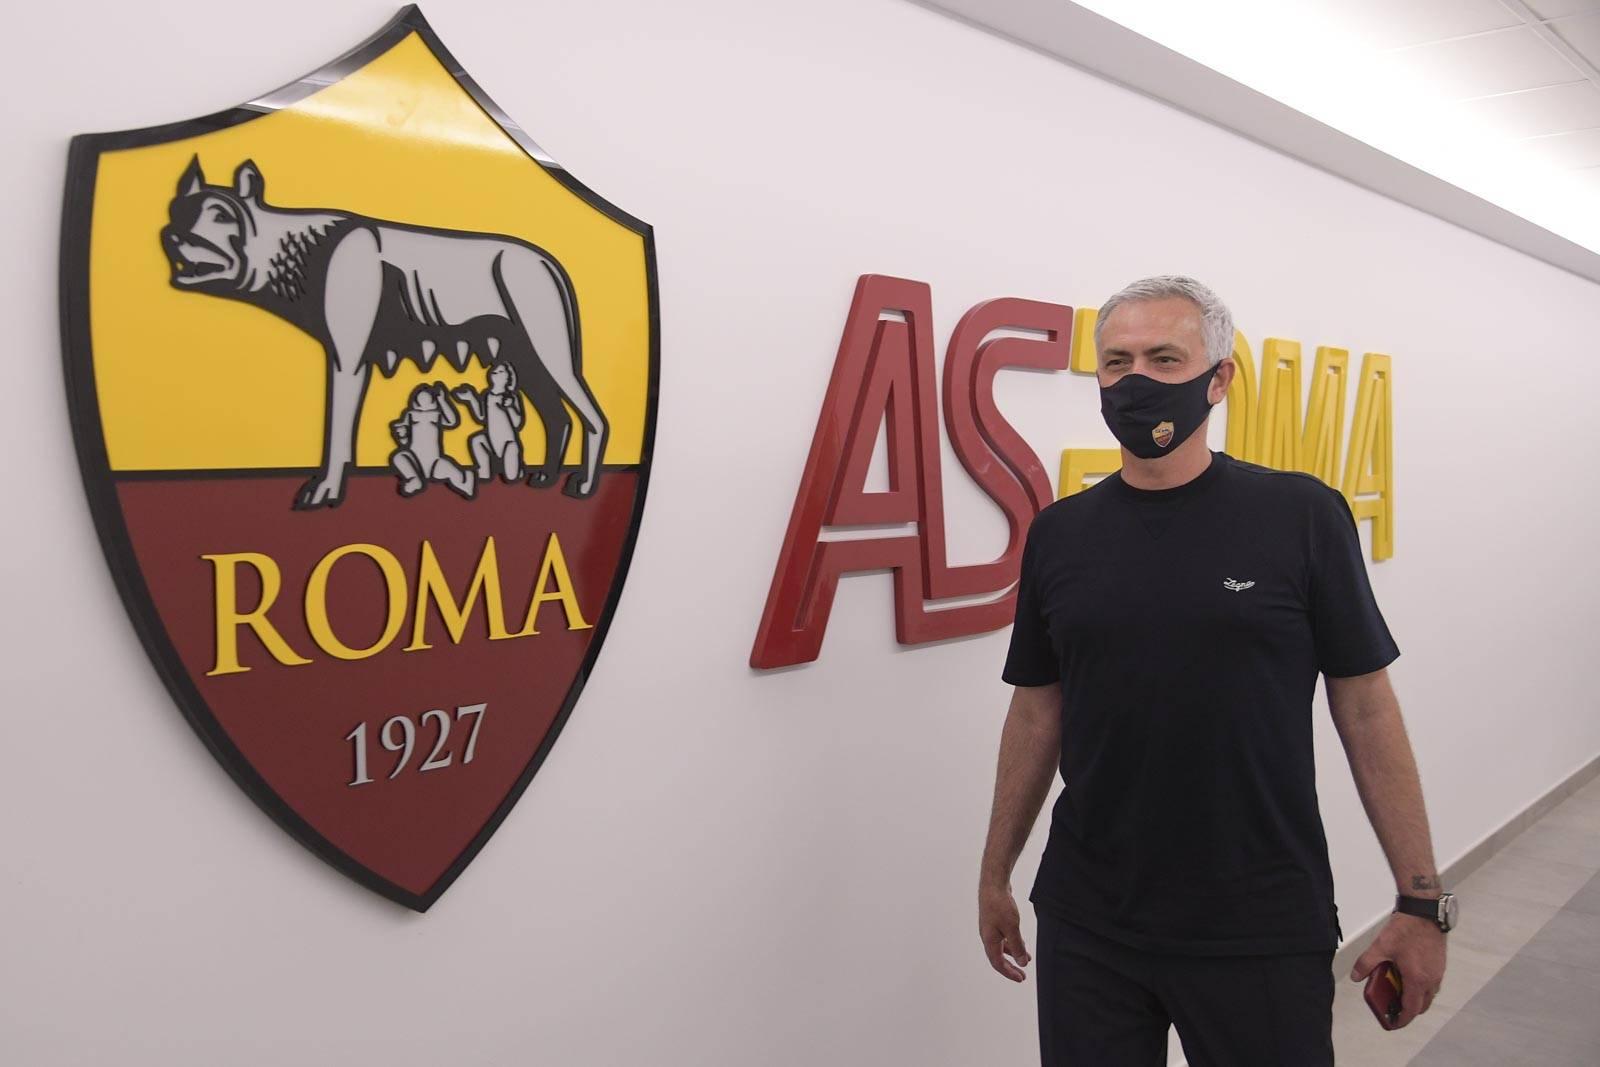 Mourinho telah berada di Roma sejak 2 Juli untuk memulai pekerjaan baru di AS Roma.  Foto: Twitter / AS Roma